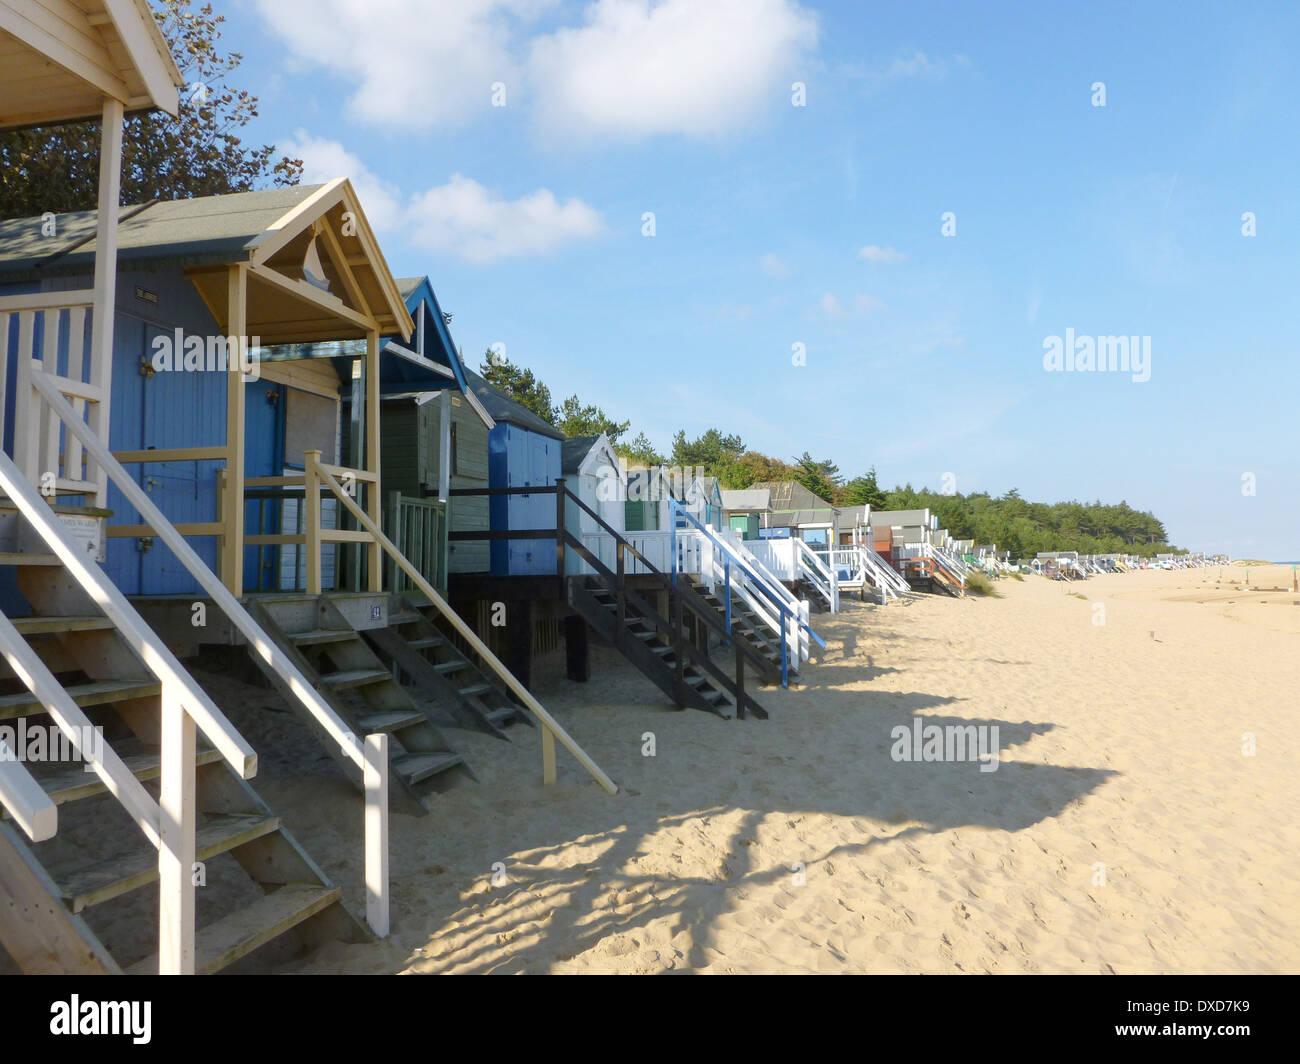 Beach huts at Wells next the Sea, Norfolk, England Stock Photo